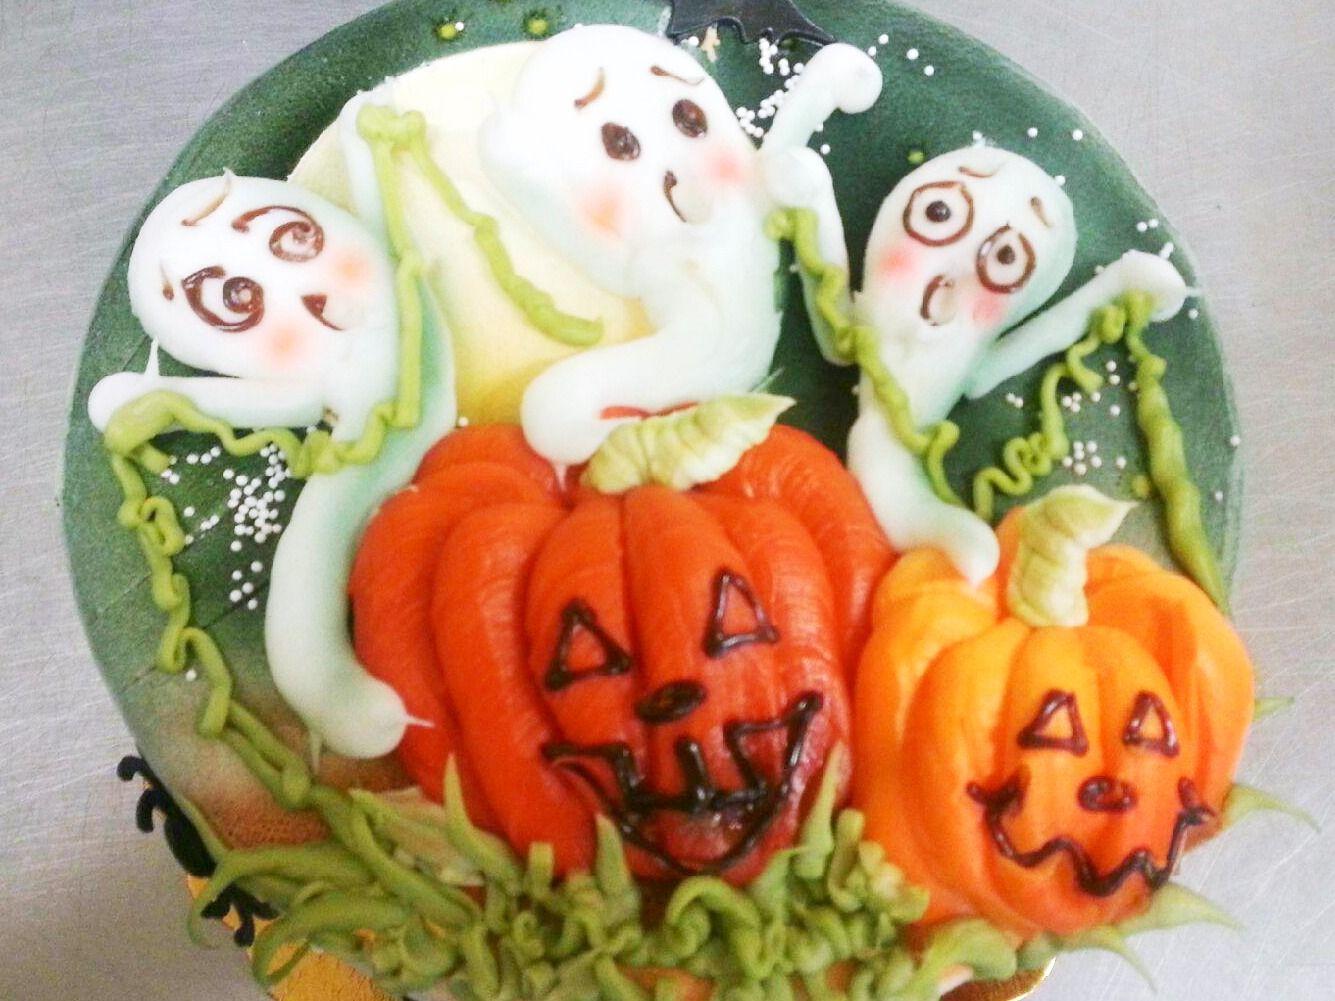 Ghost and pumpkin Halloween cake